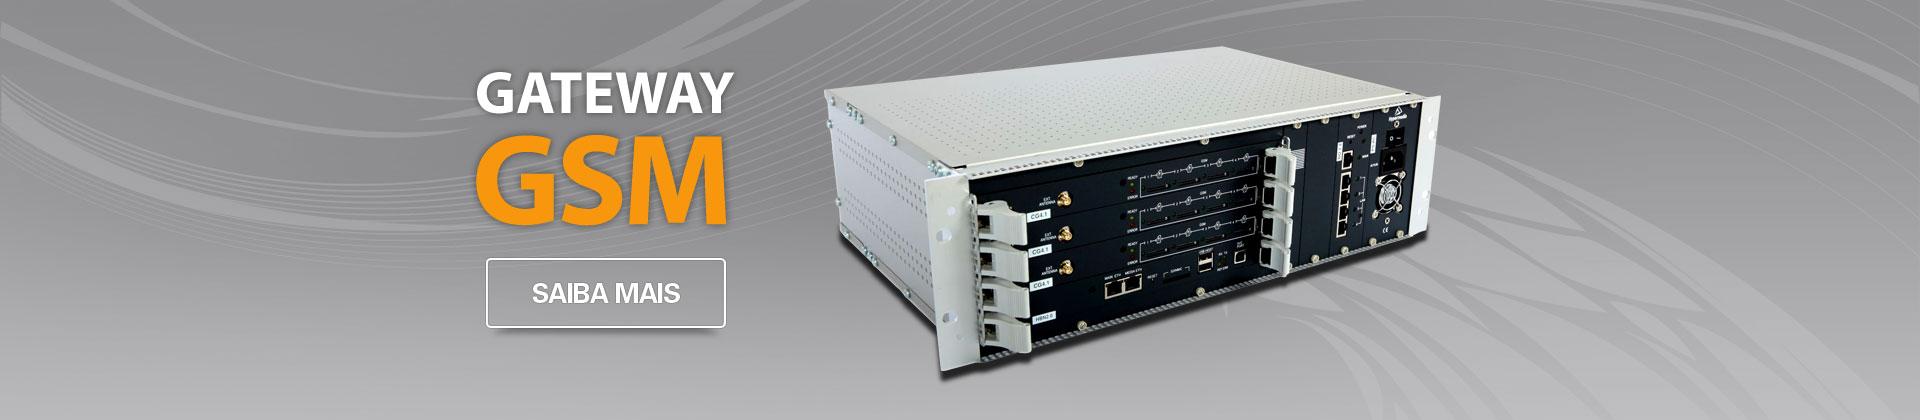 gateway-gsm-bs-tecnologia